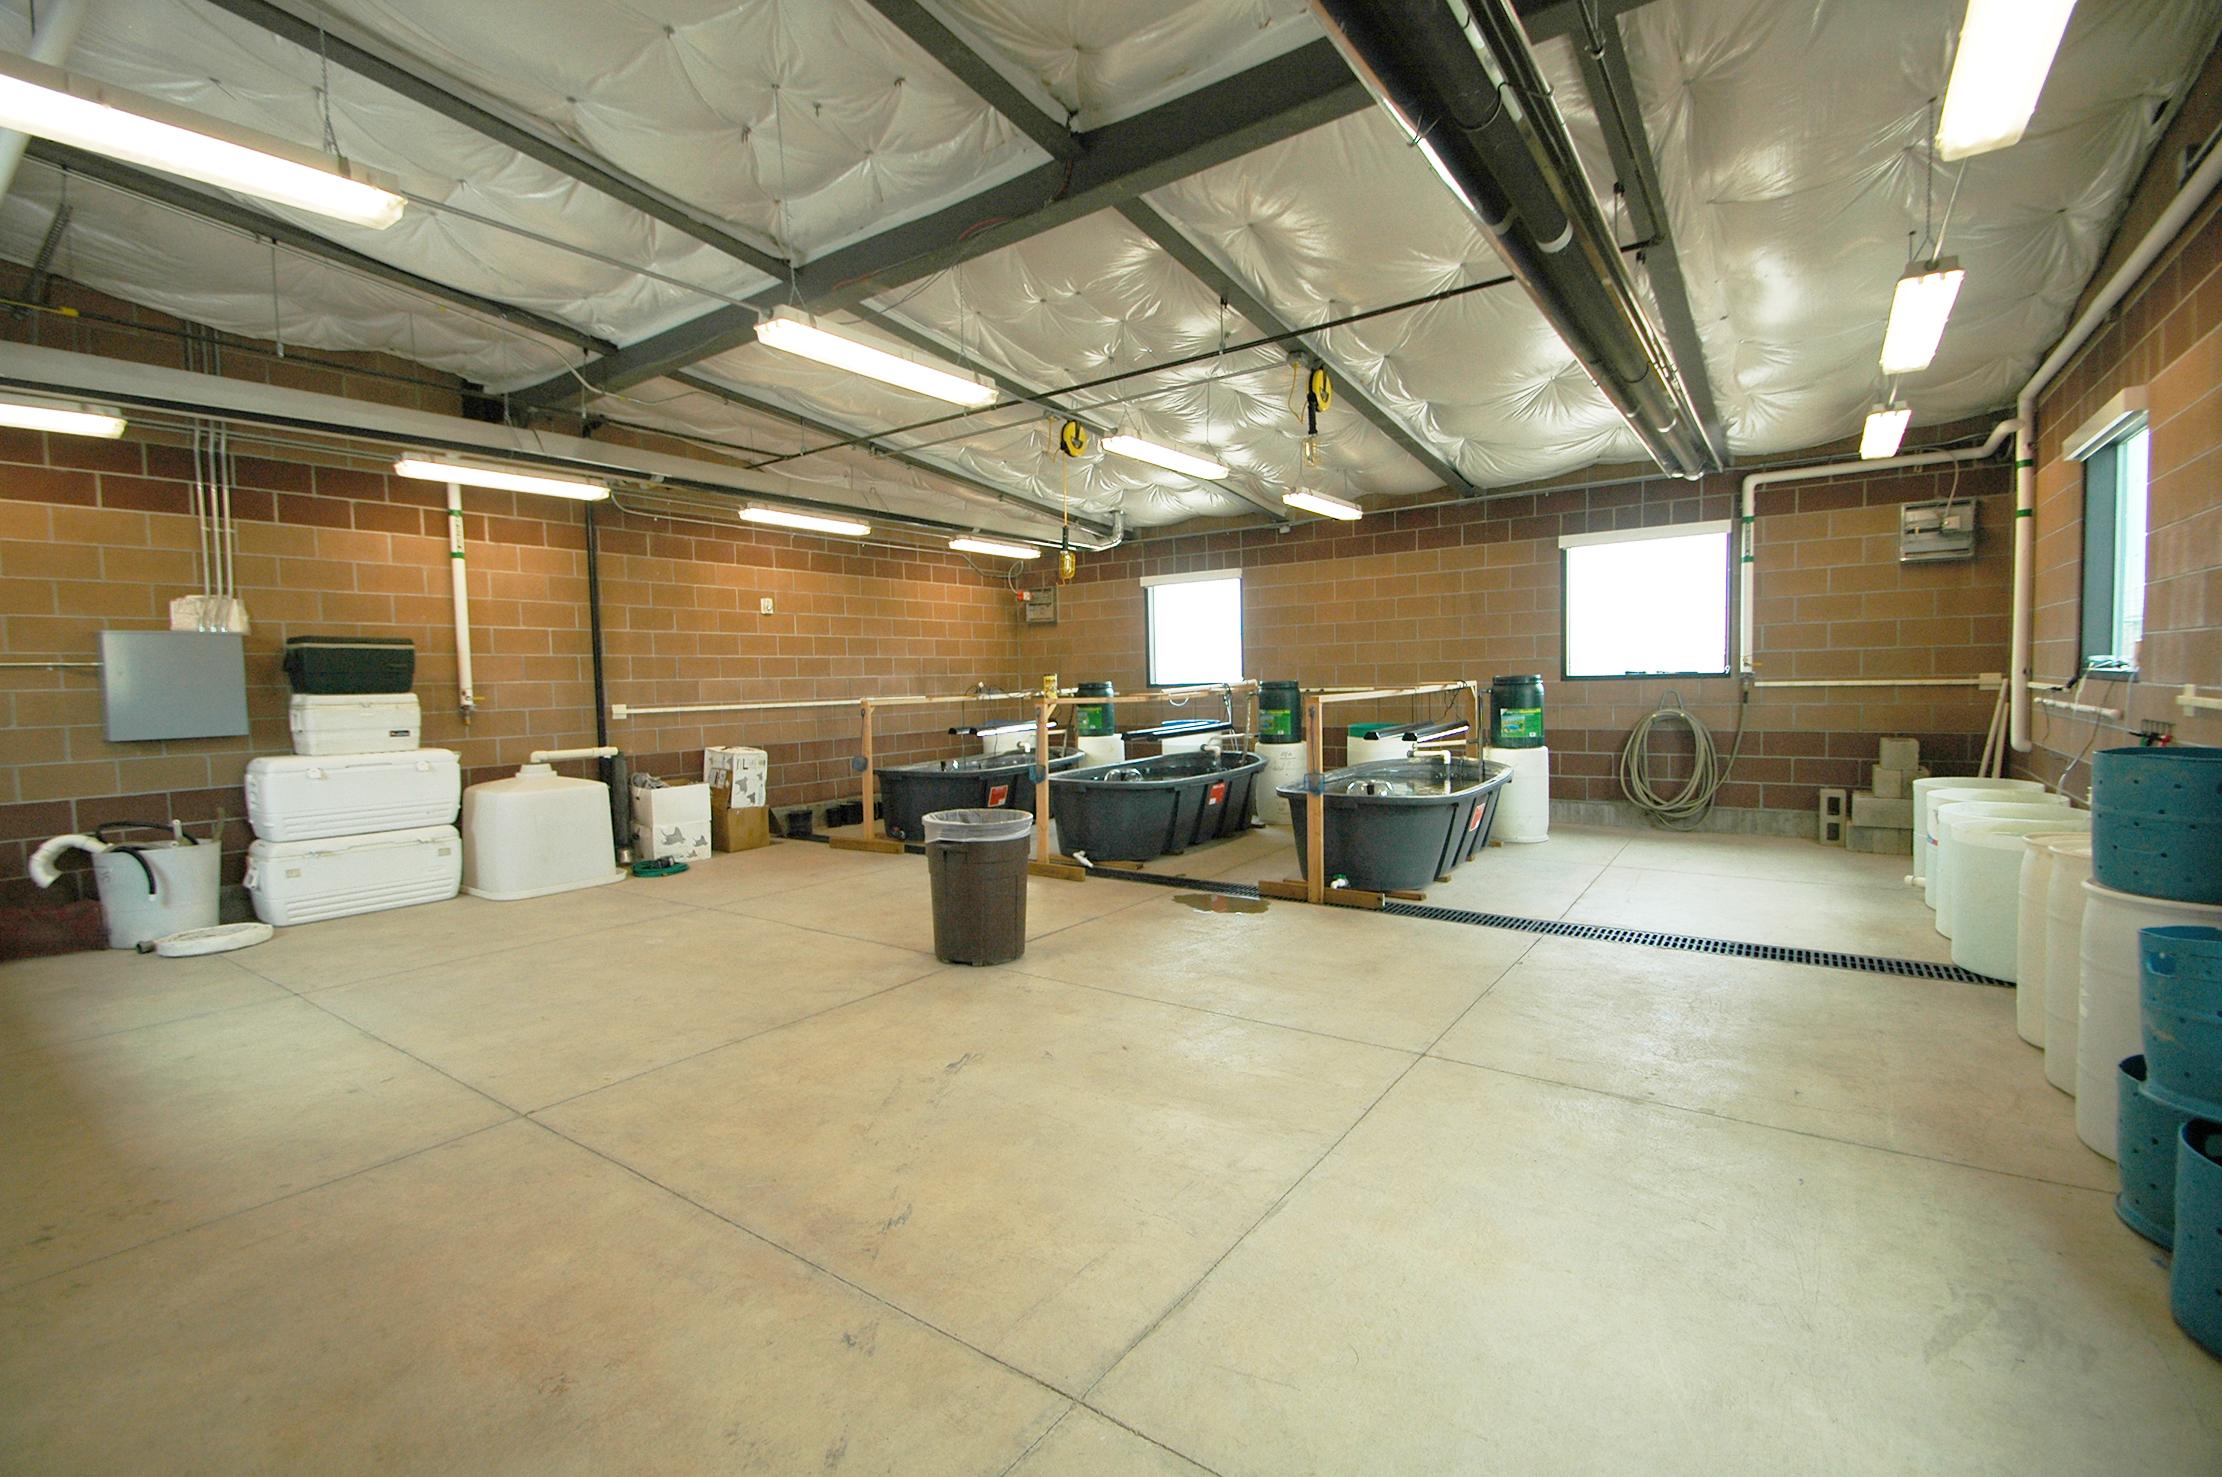 South Salt Lake Mosquito Abatement District Research Storage Area - West Jordan, UT